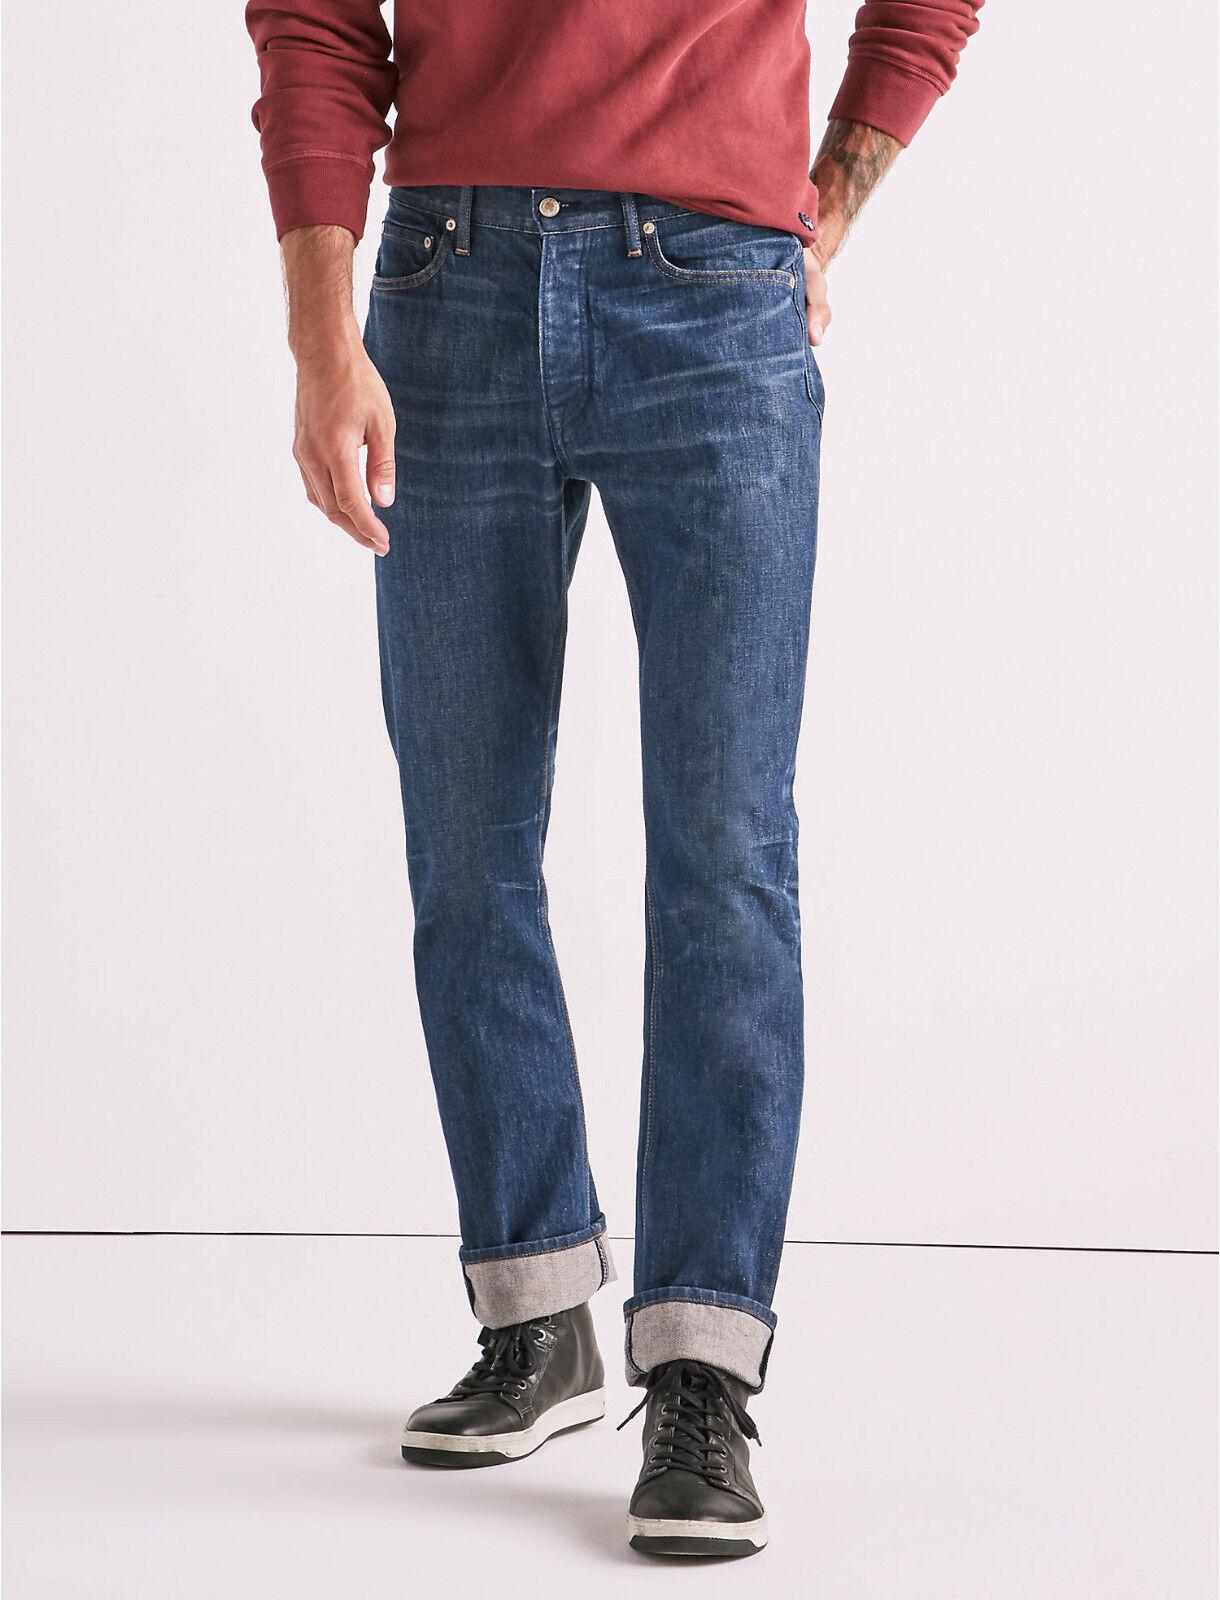 Lucky Brand Hergestellt in USA 410 Athletic Schmal Herren Kegel Jeans 34x32